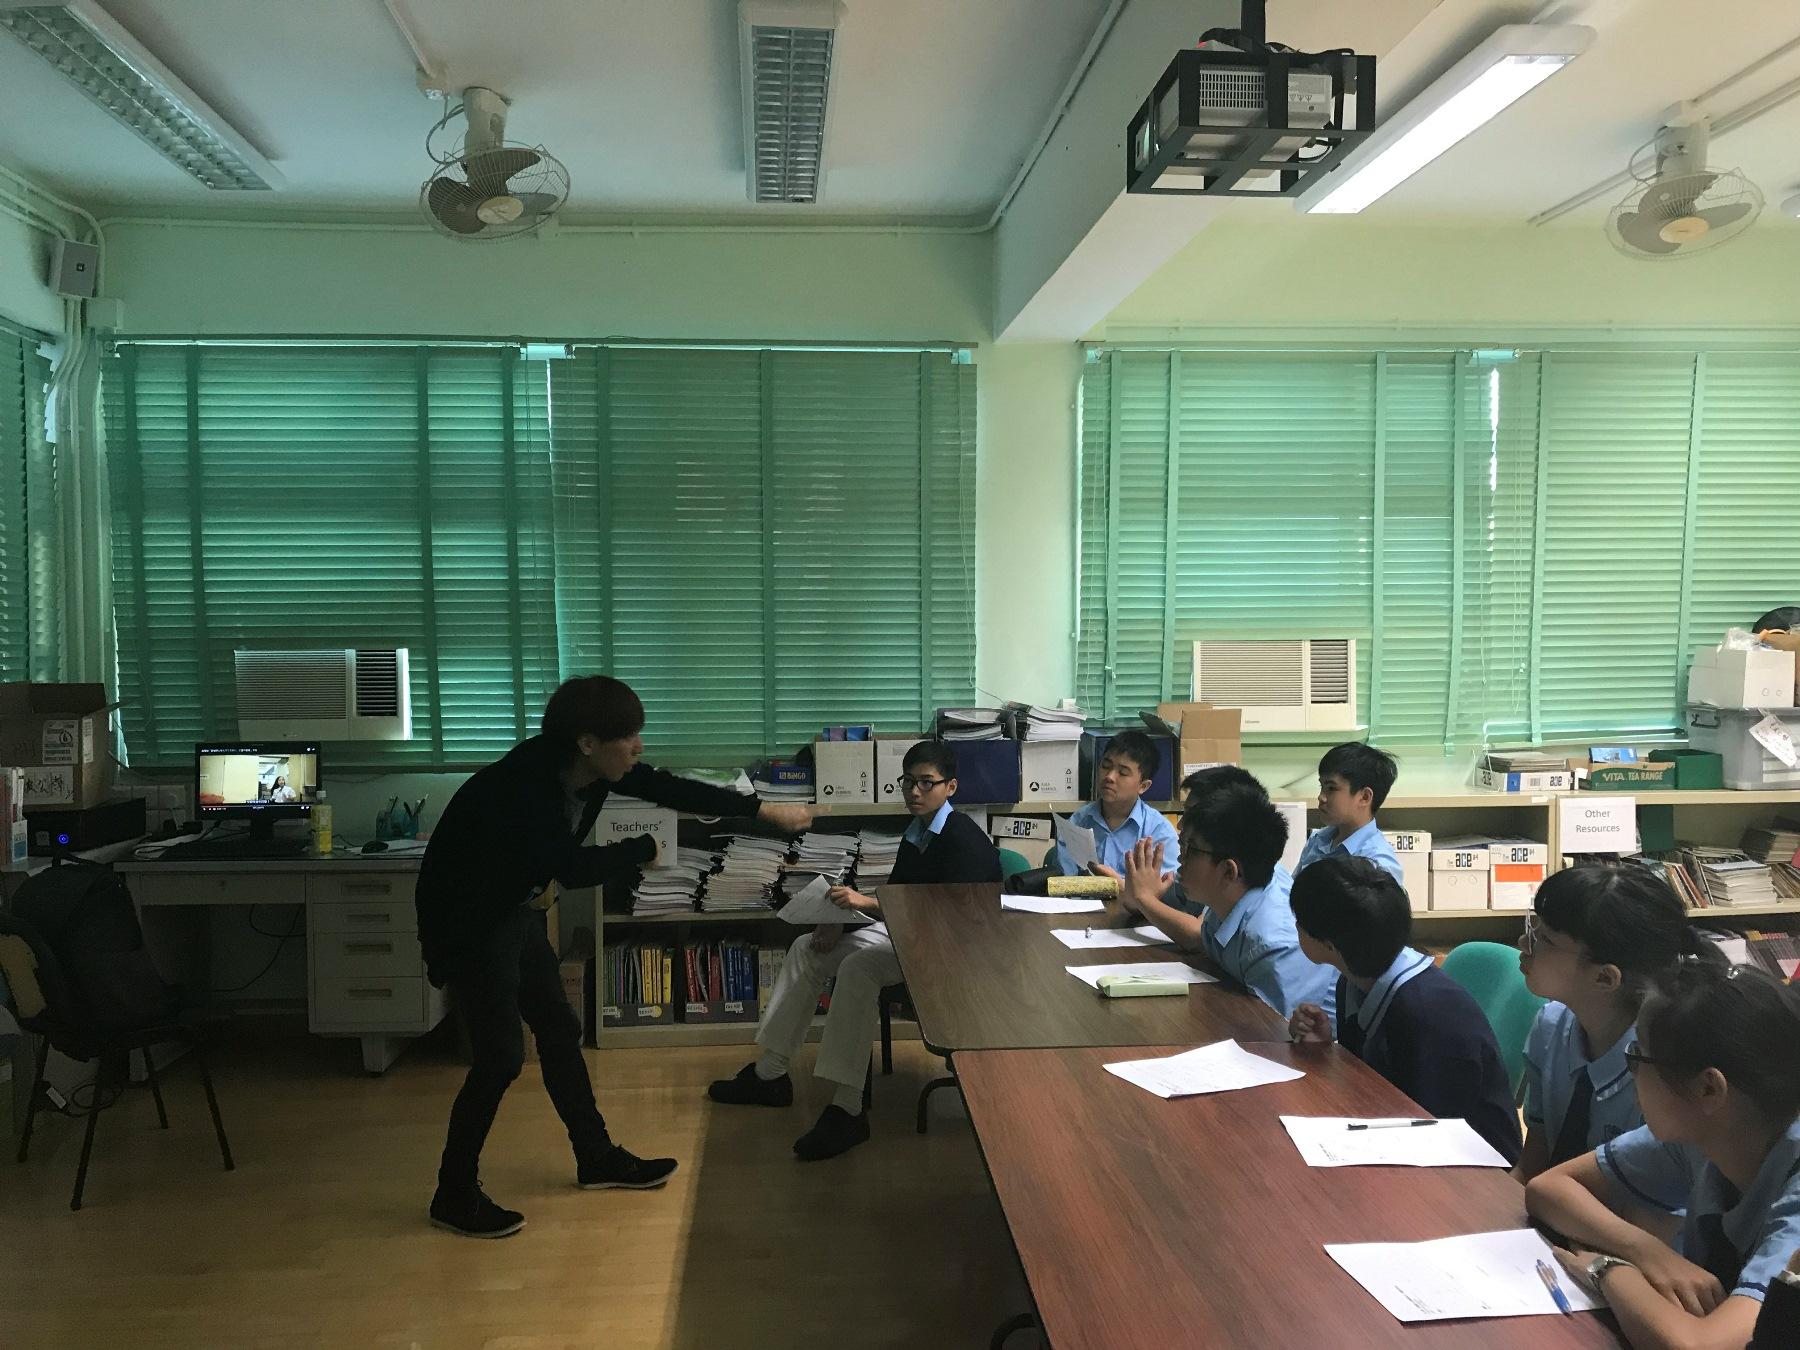 http://npc.edu.hk/sites/default/files/img_0615.jpg